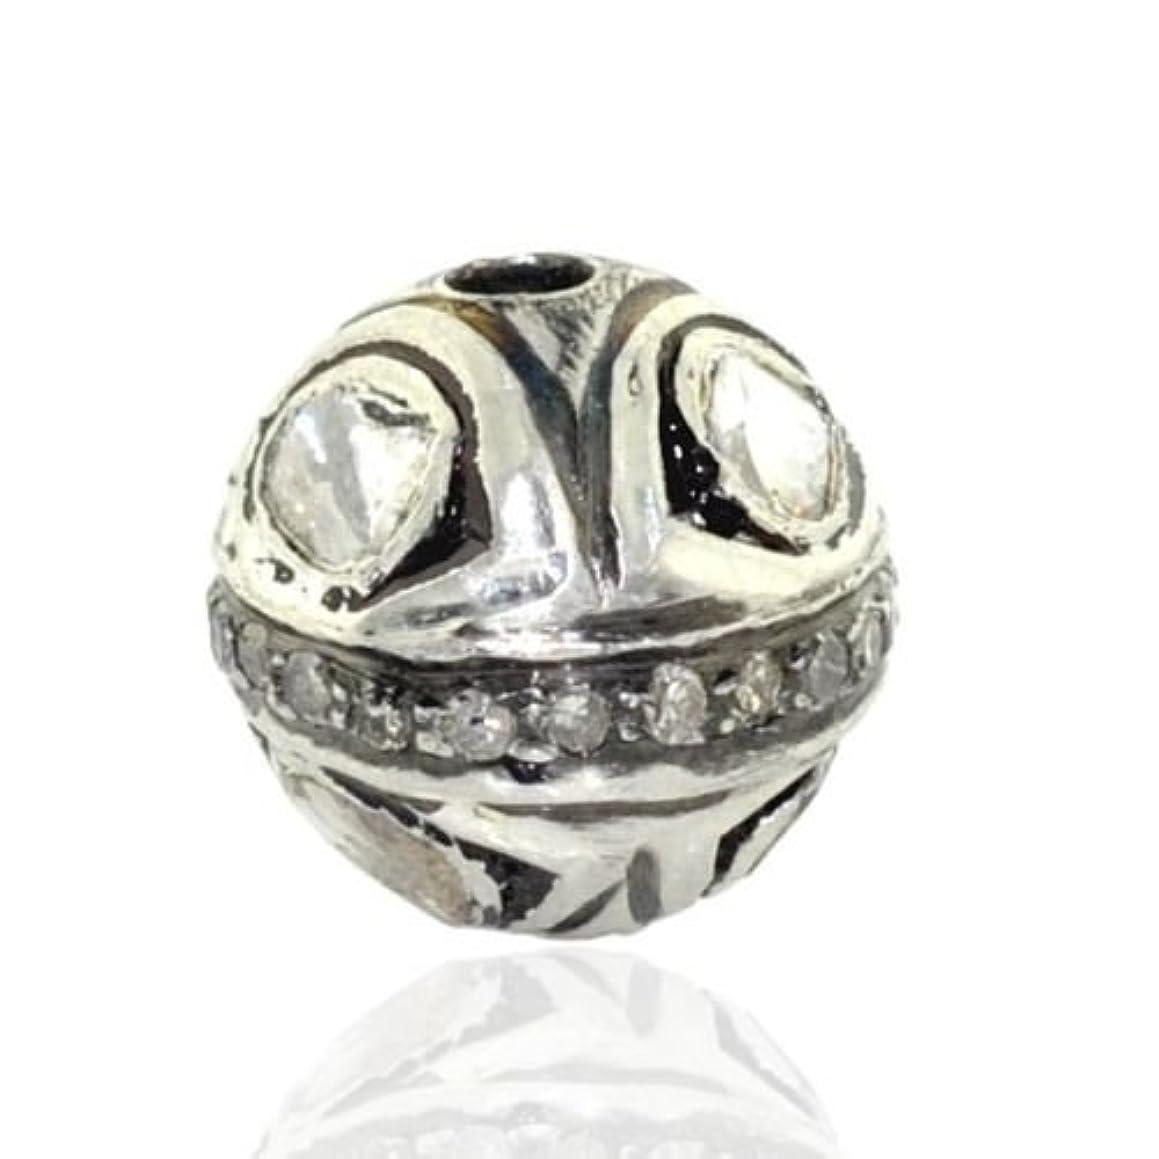 Rose Cut Diamond Silver 13mm Bead Ball Jewelry making supply- PJBE2043